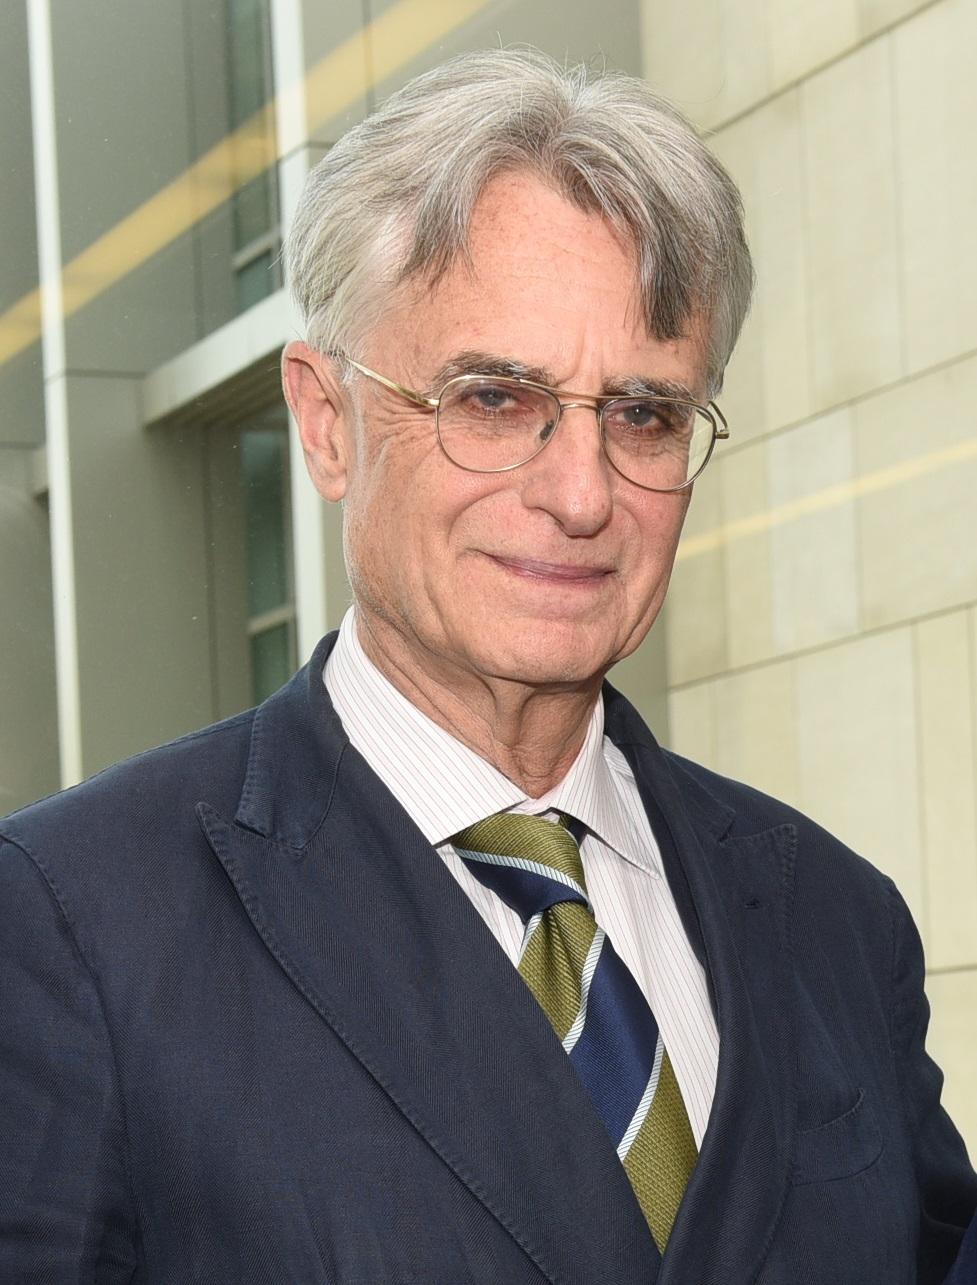 Horacio A. Grigera Naon